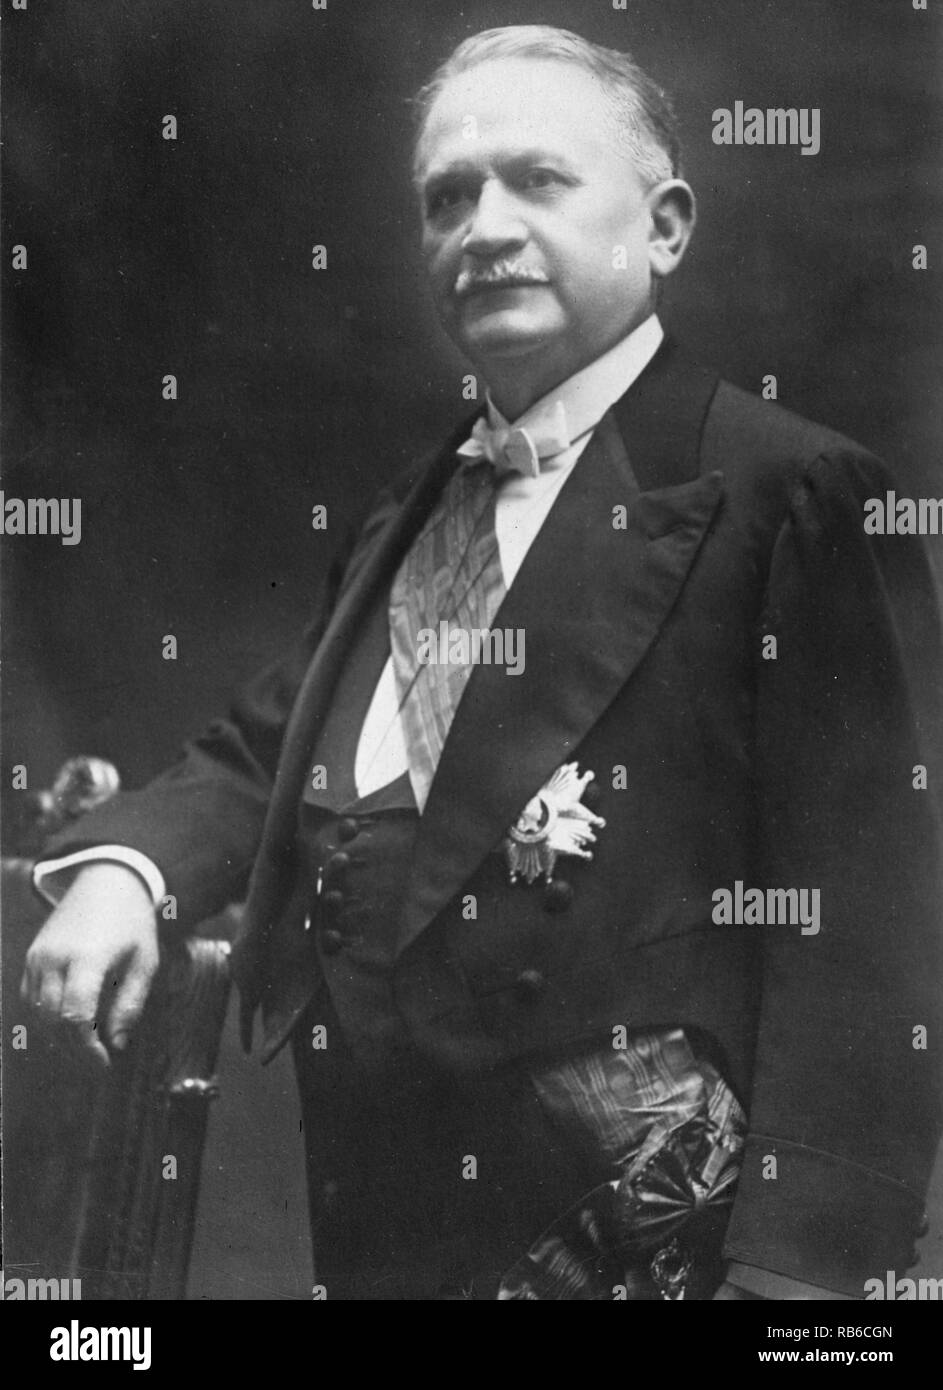 Gaston Doumergue, Pierre-Paul-Henri-Gaston Doumergue (1863 - 1937) French politician of the Third Republic. - Stock Image